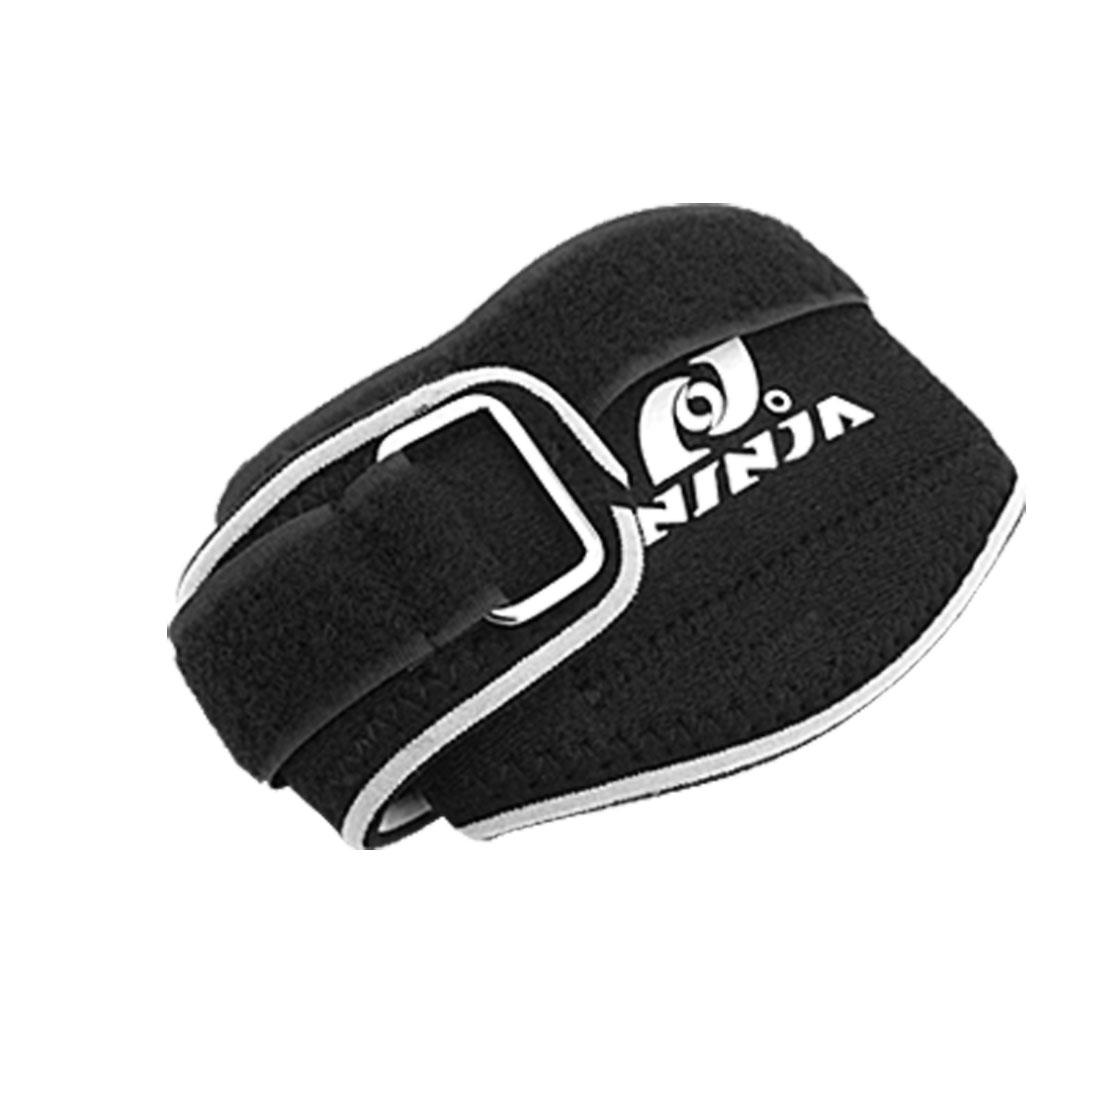 Adjustable Neoprene Sports Knee Support Pad Brace Protector